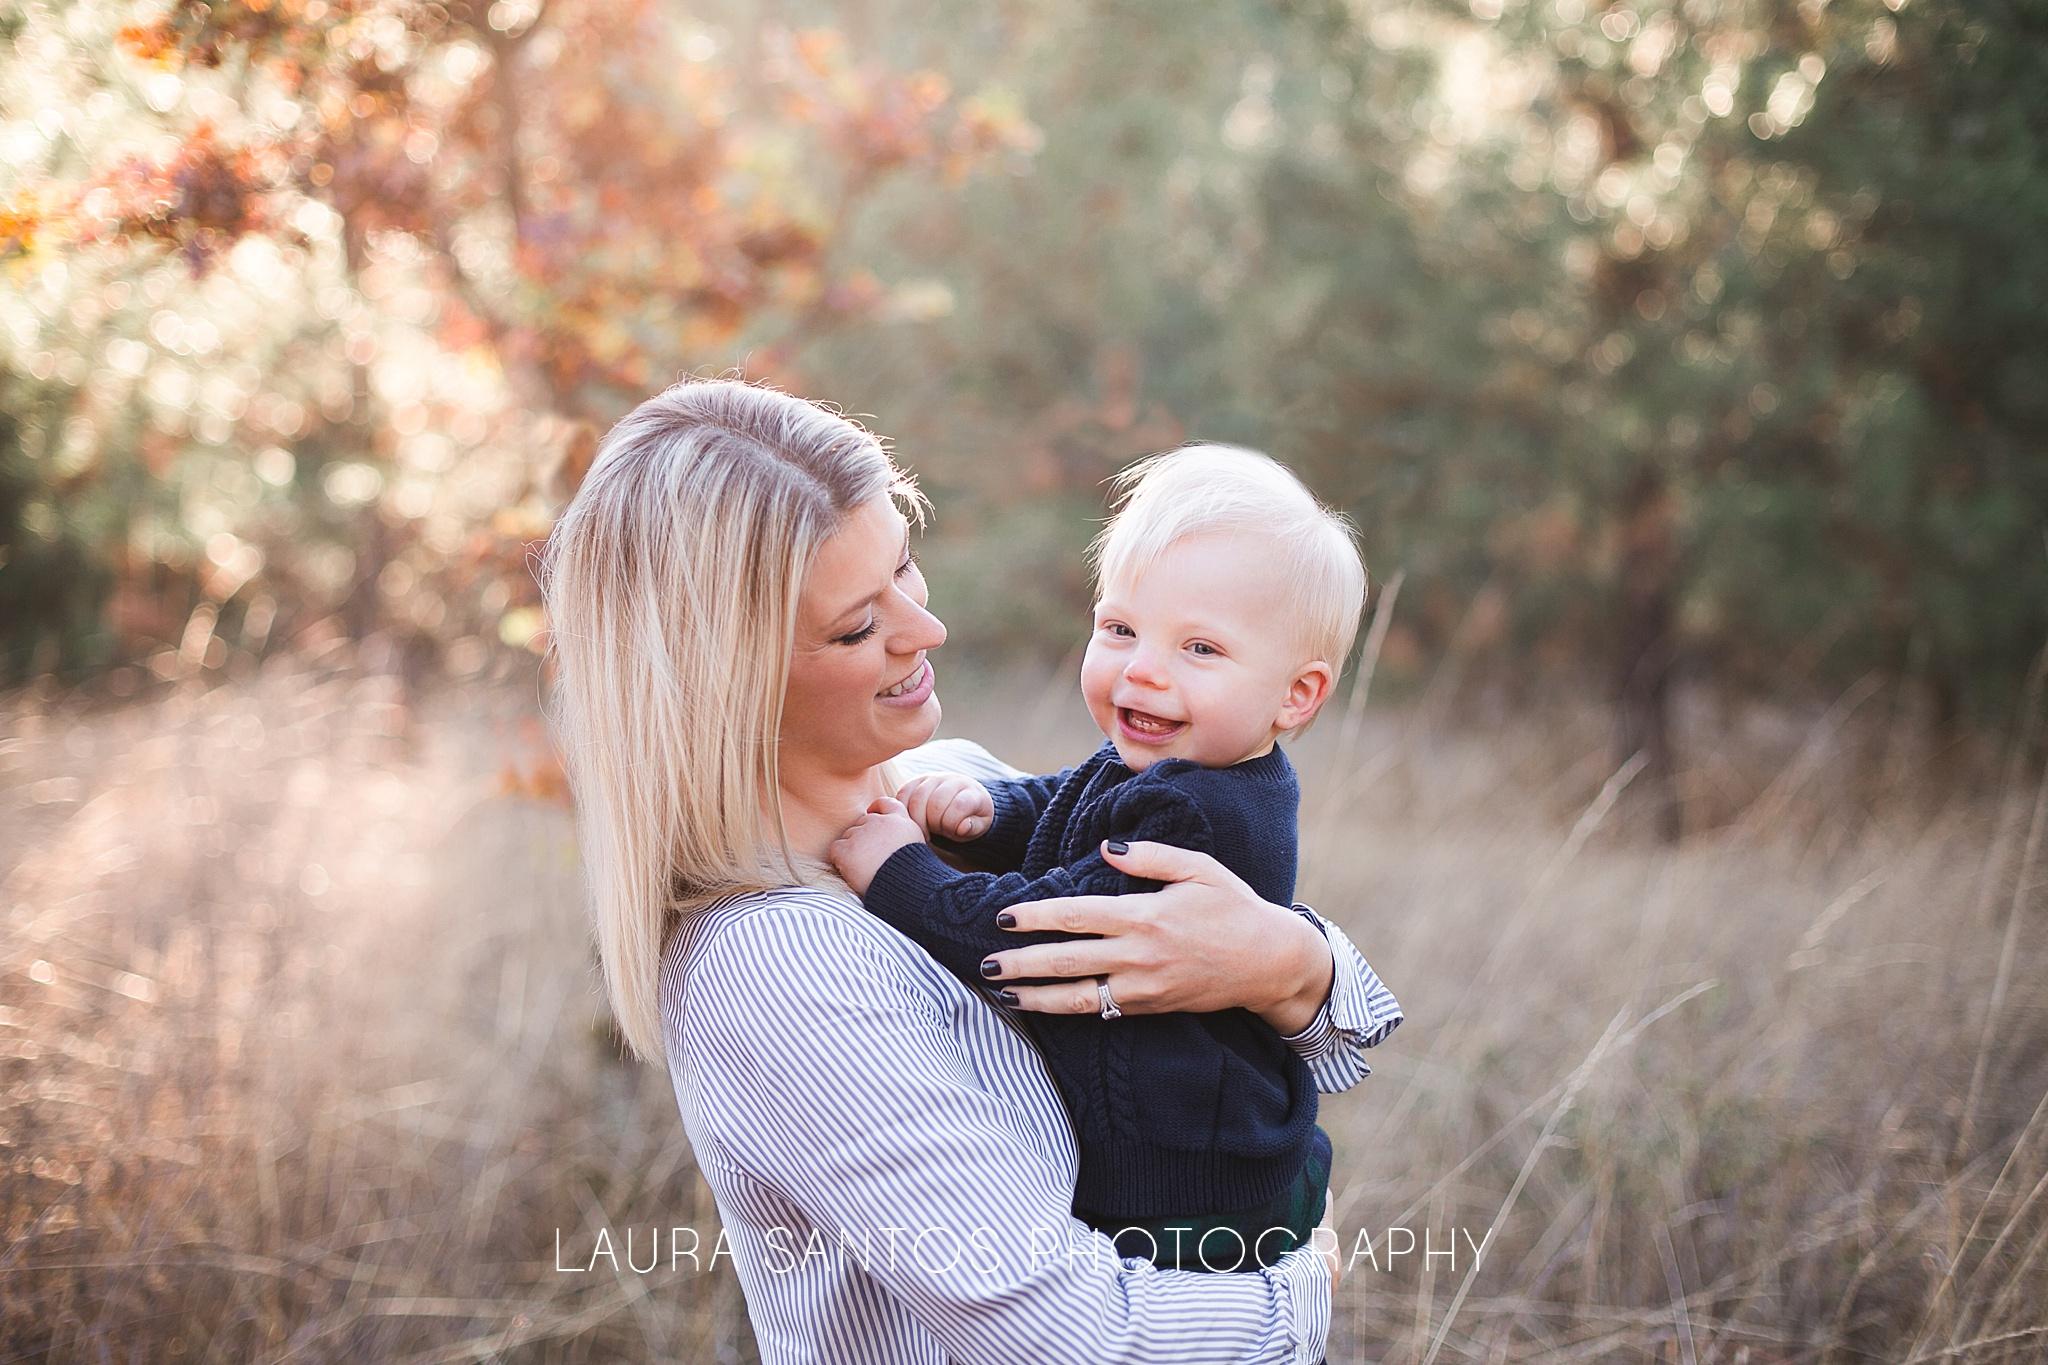 Laura Santos Photography Portland Oregon Family Photographer_0619.jpg